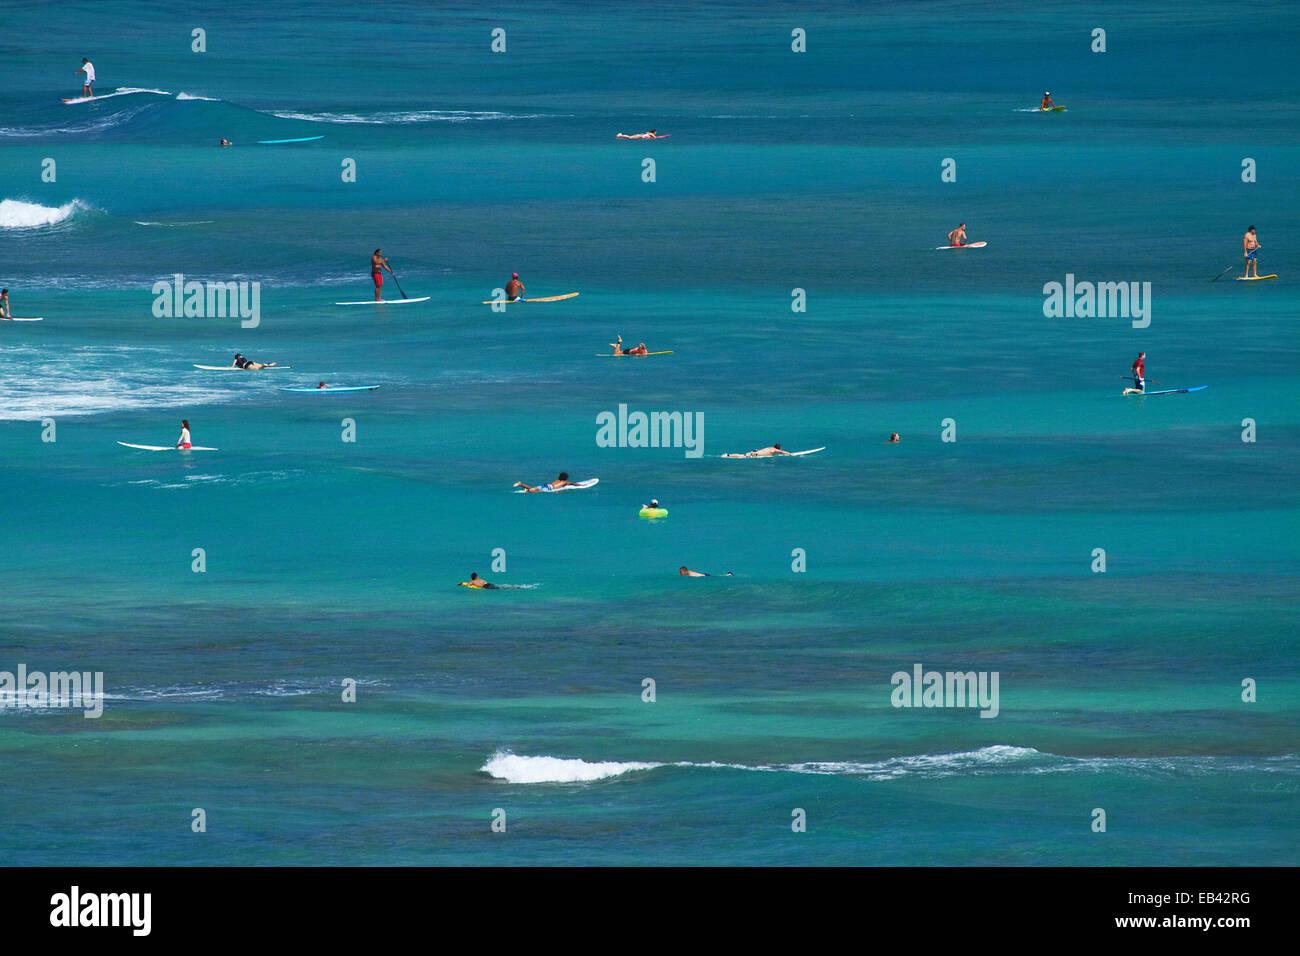 Surfers and stand up paddle boarders, Waikiki, Honolulu, Oahu, Hawaii, USA - Stock Image